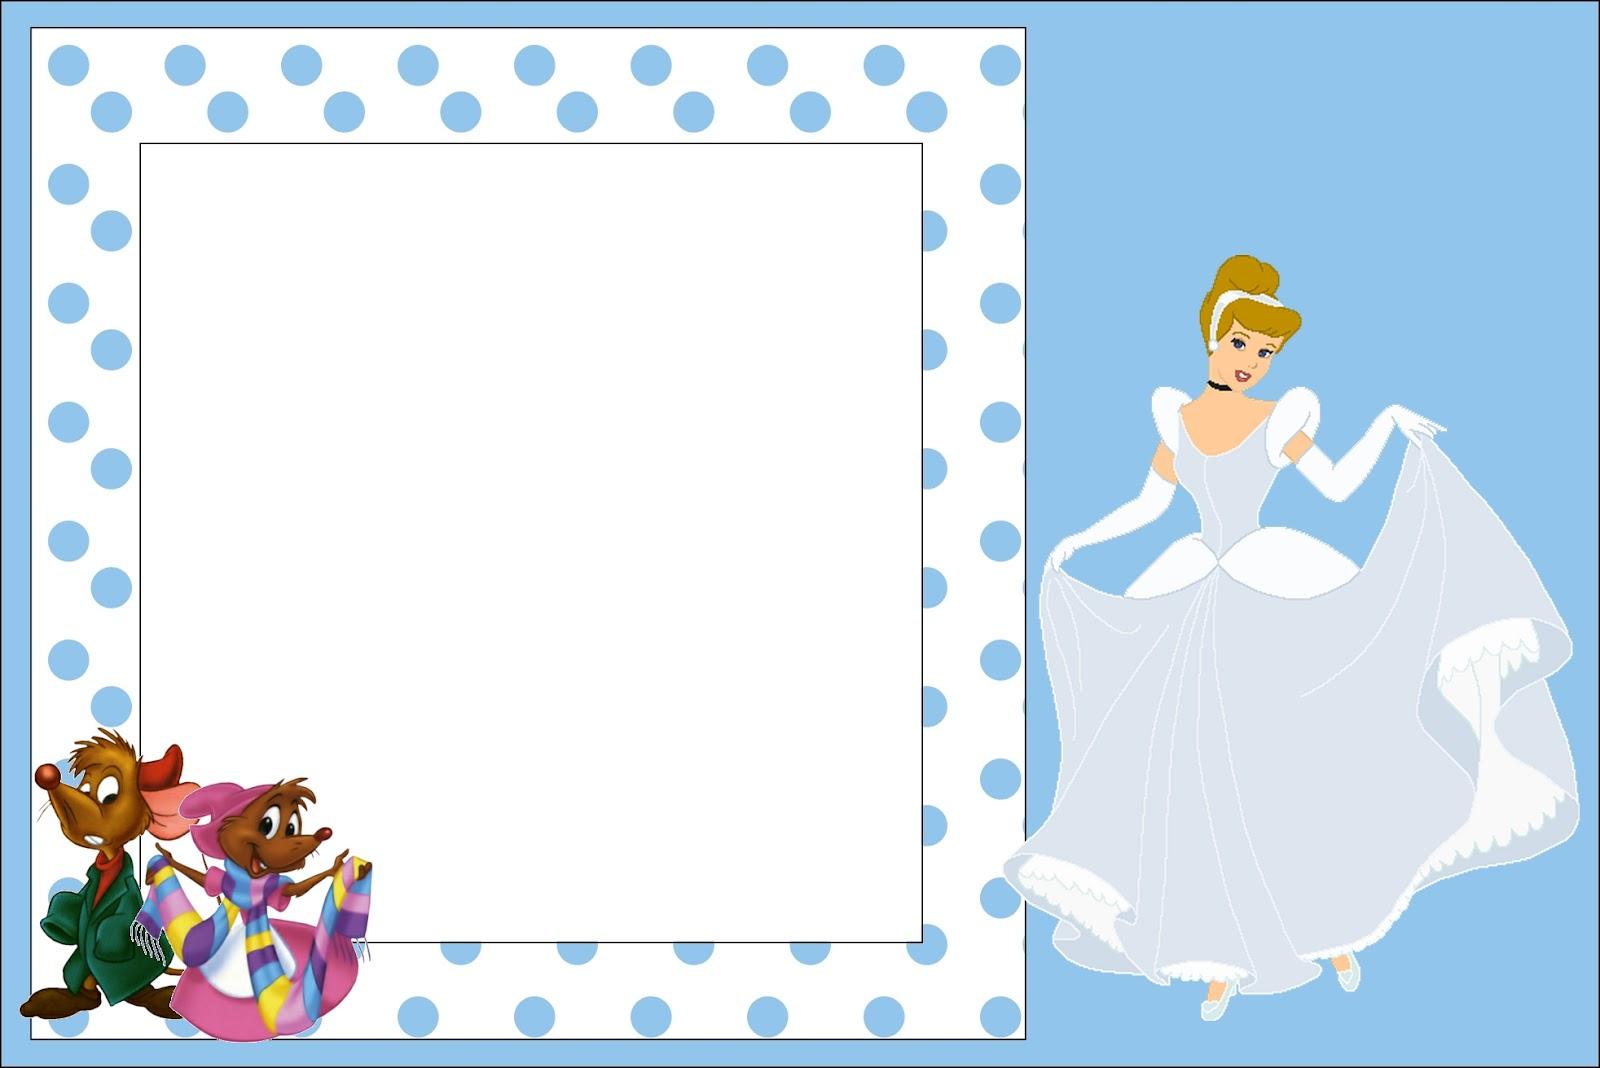 Cinderella Free Printable Invitations Oh My Fiesta In English